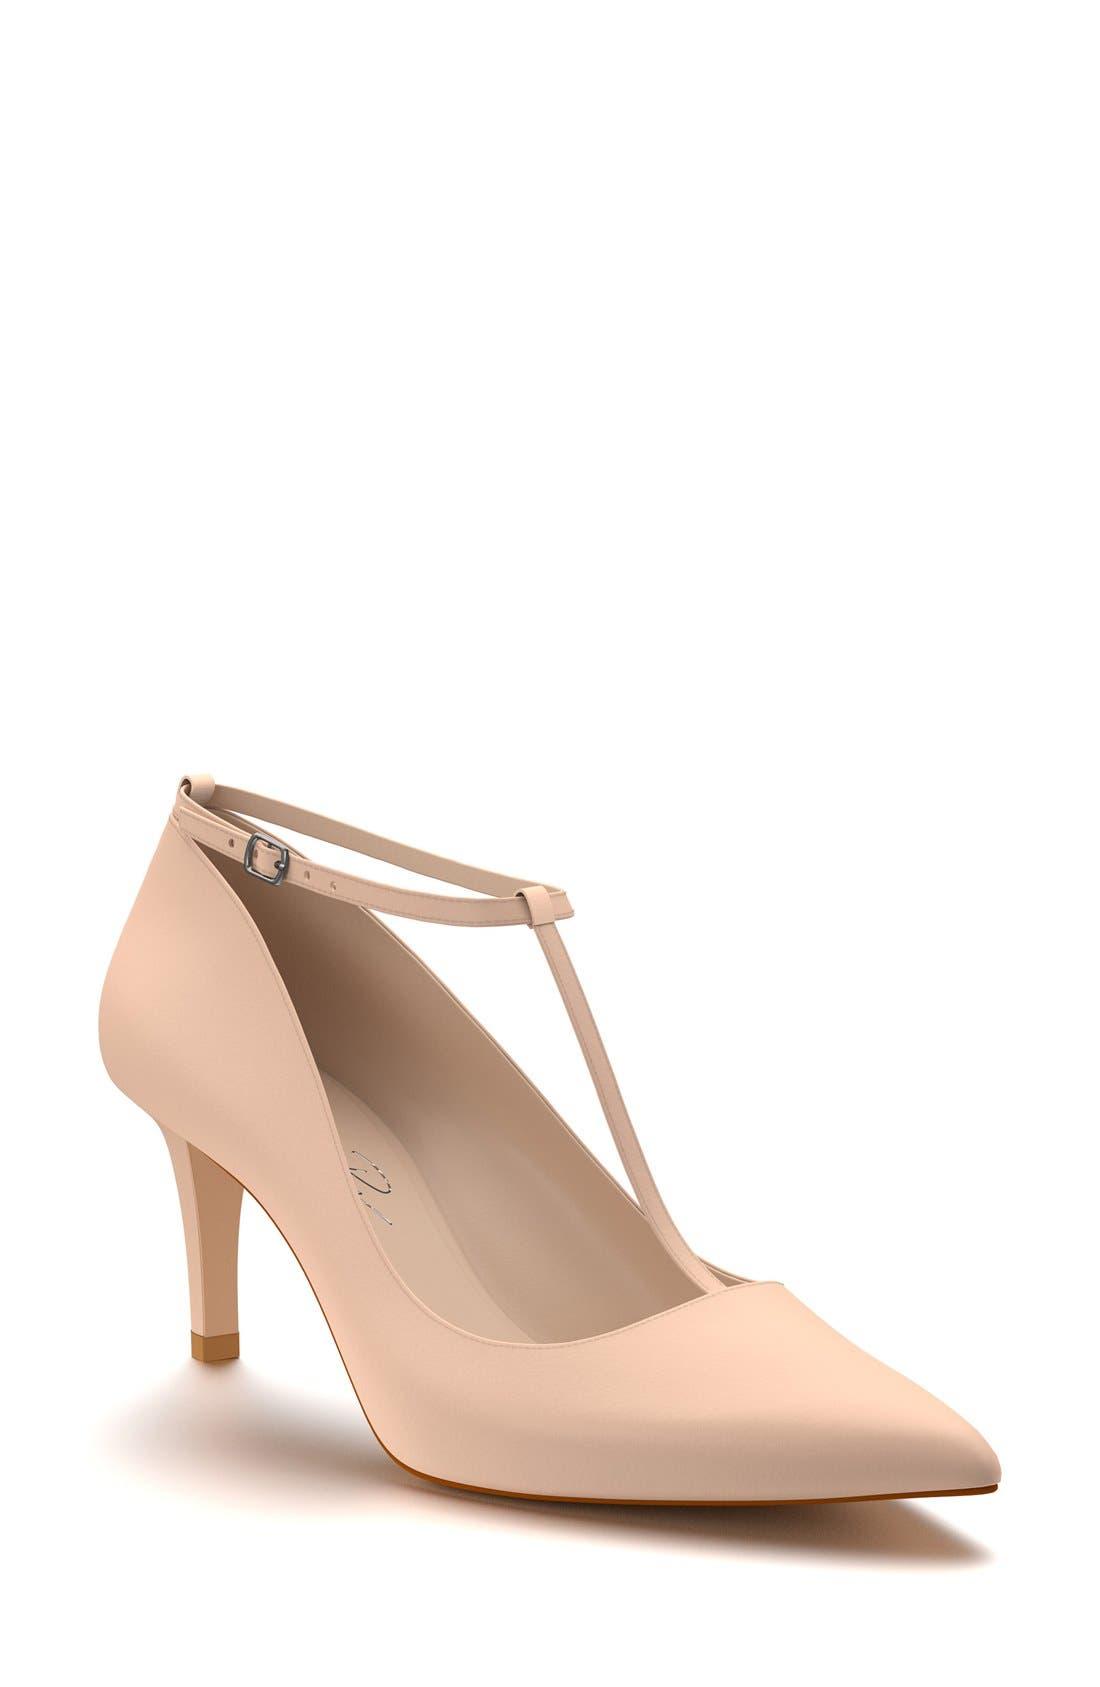 Alternate Image 1 Selected - Shoes of Prey T-Strap Pump (Women)